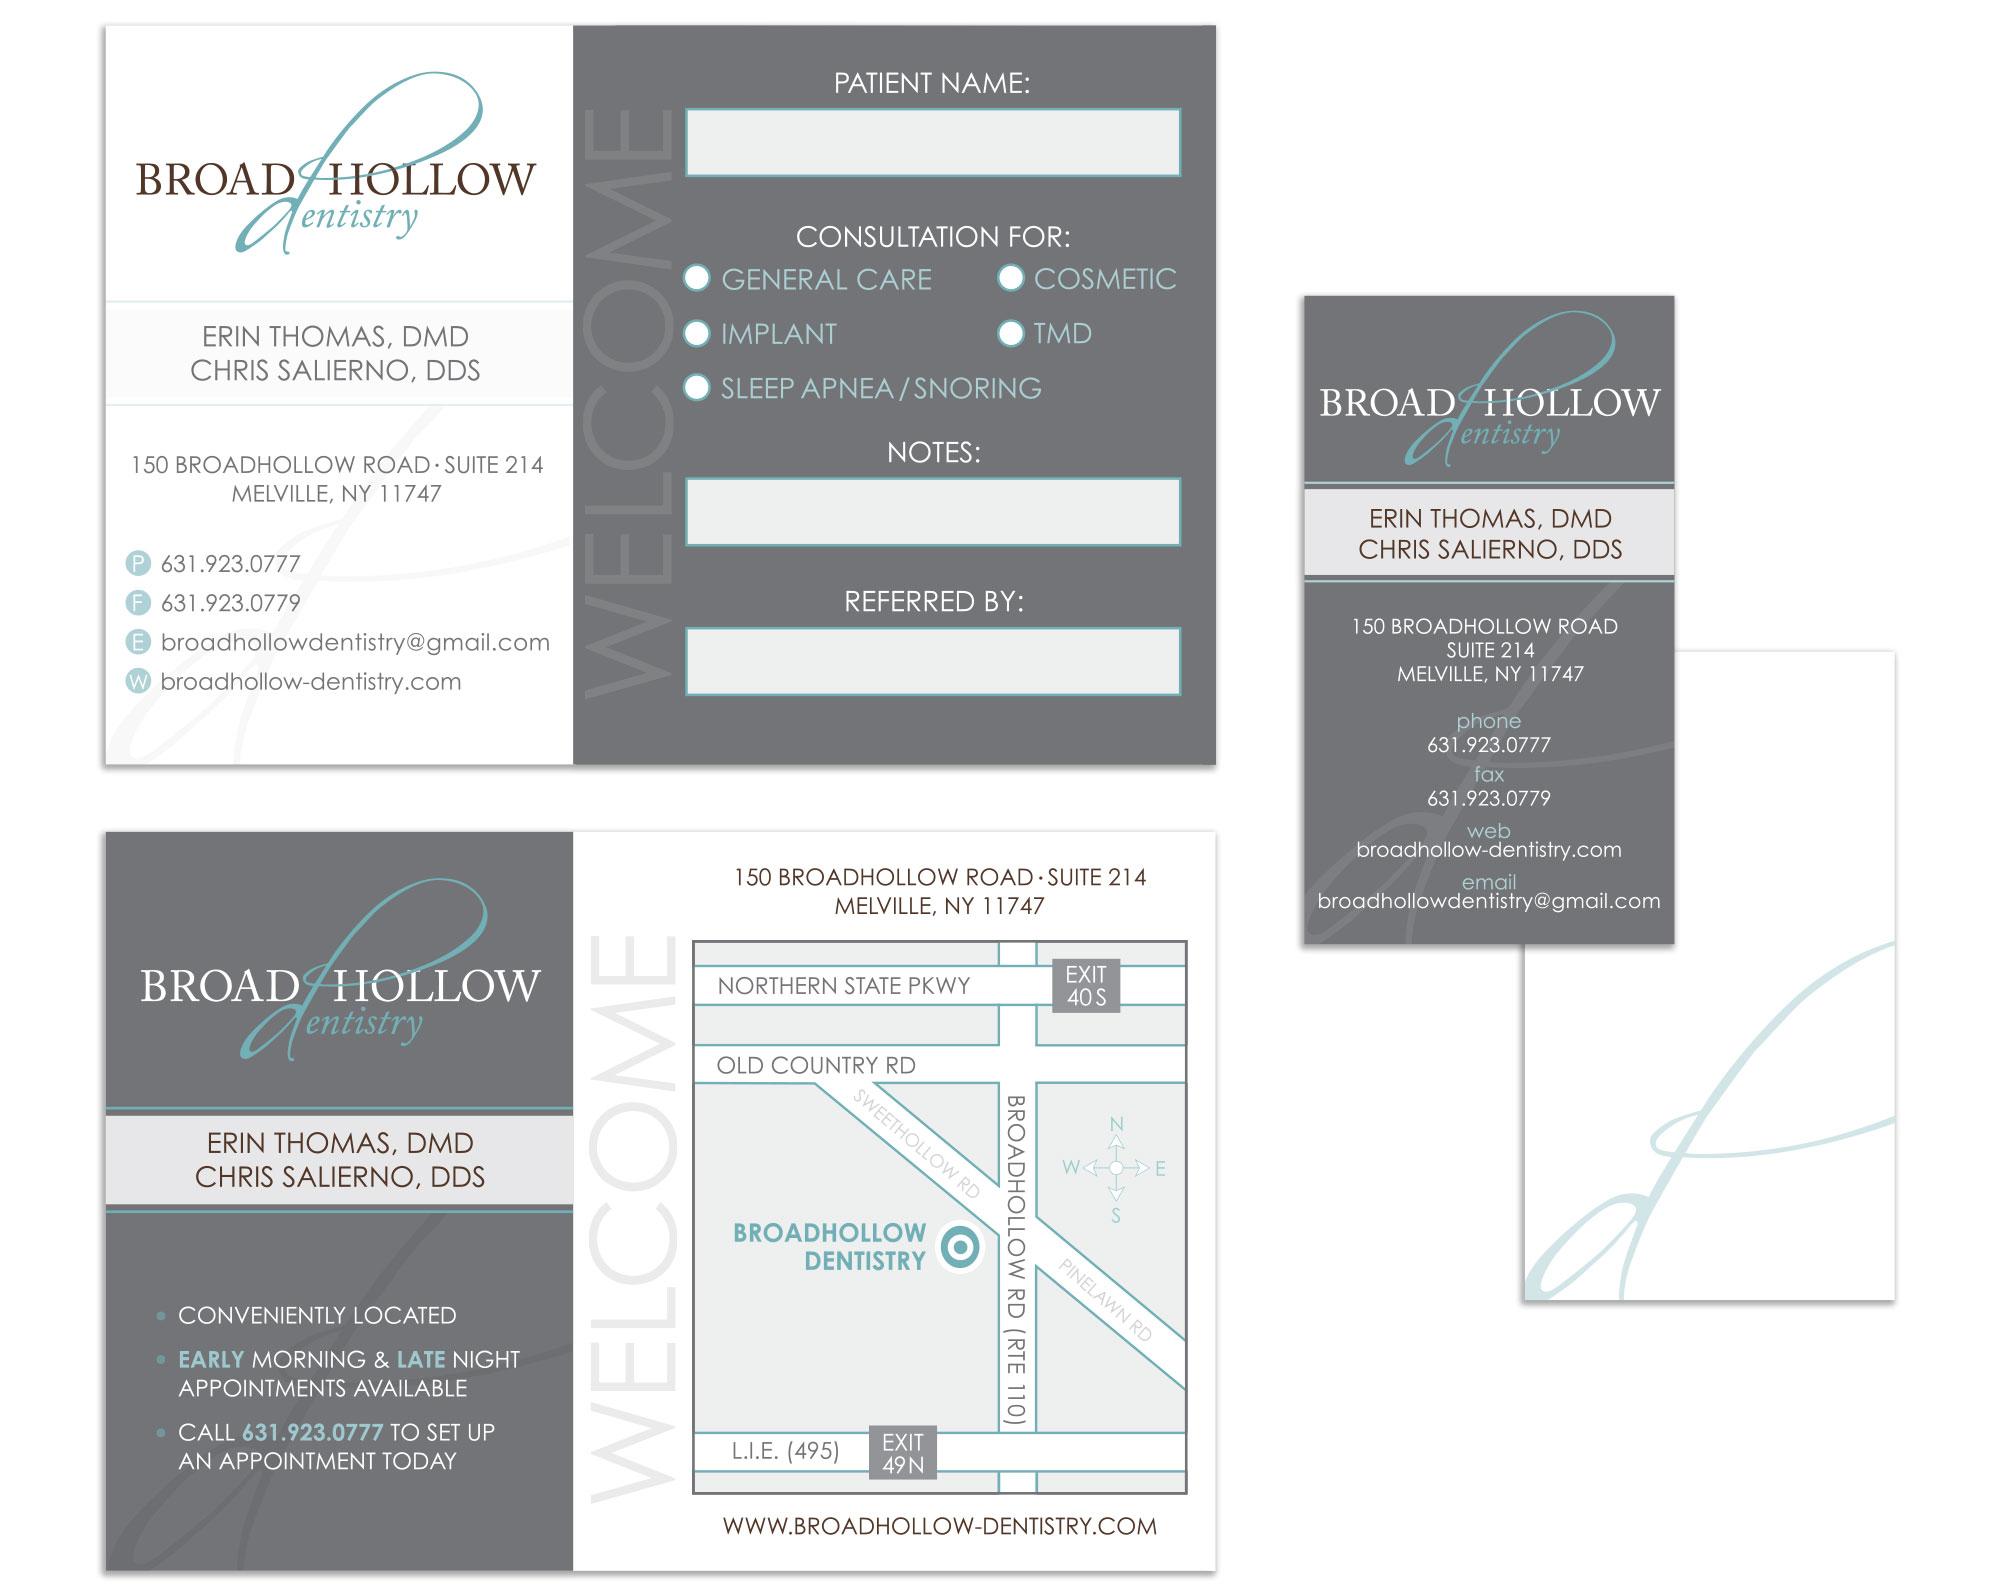 bhd_fullcards